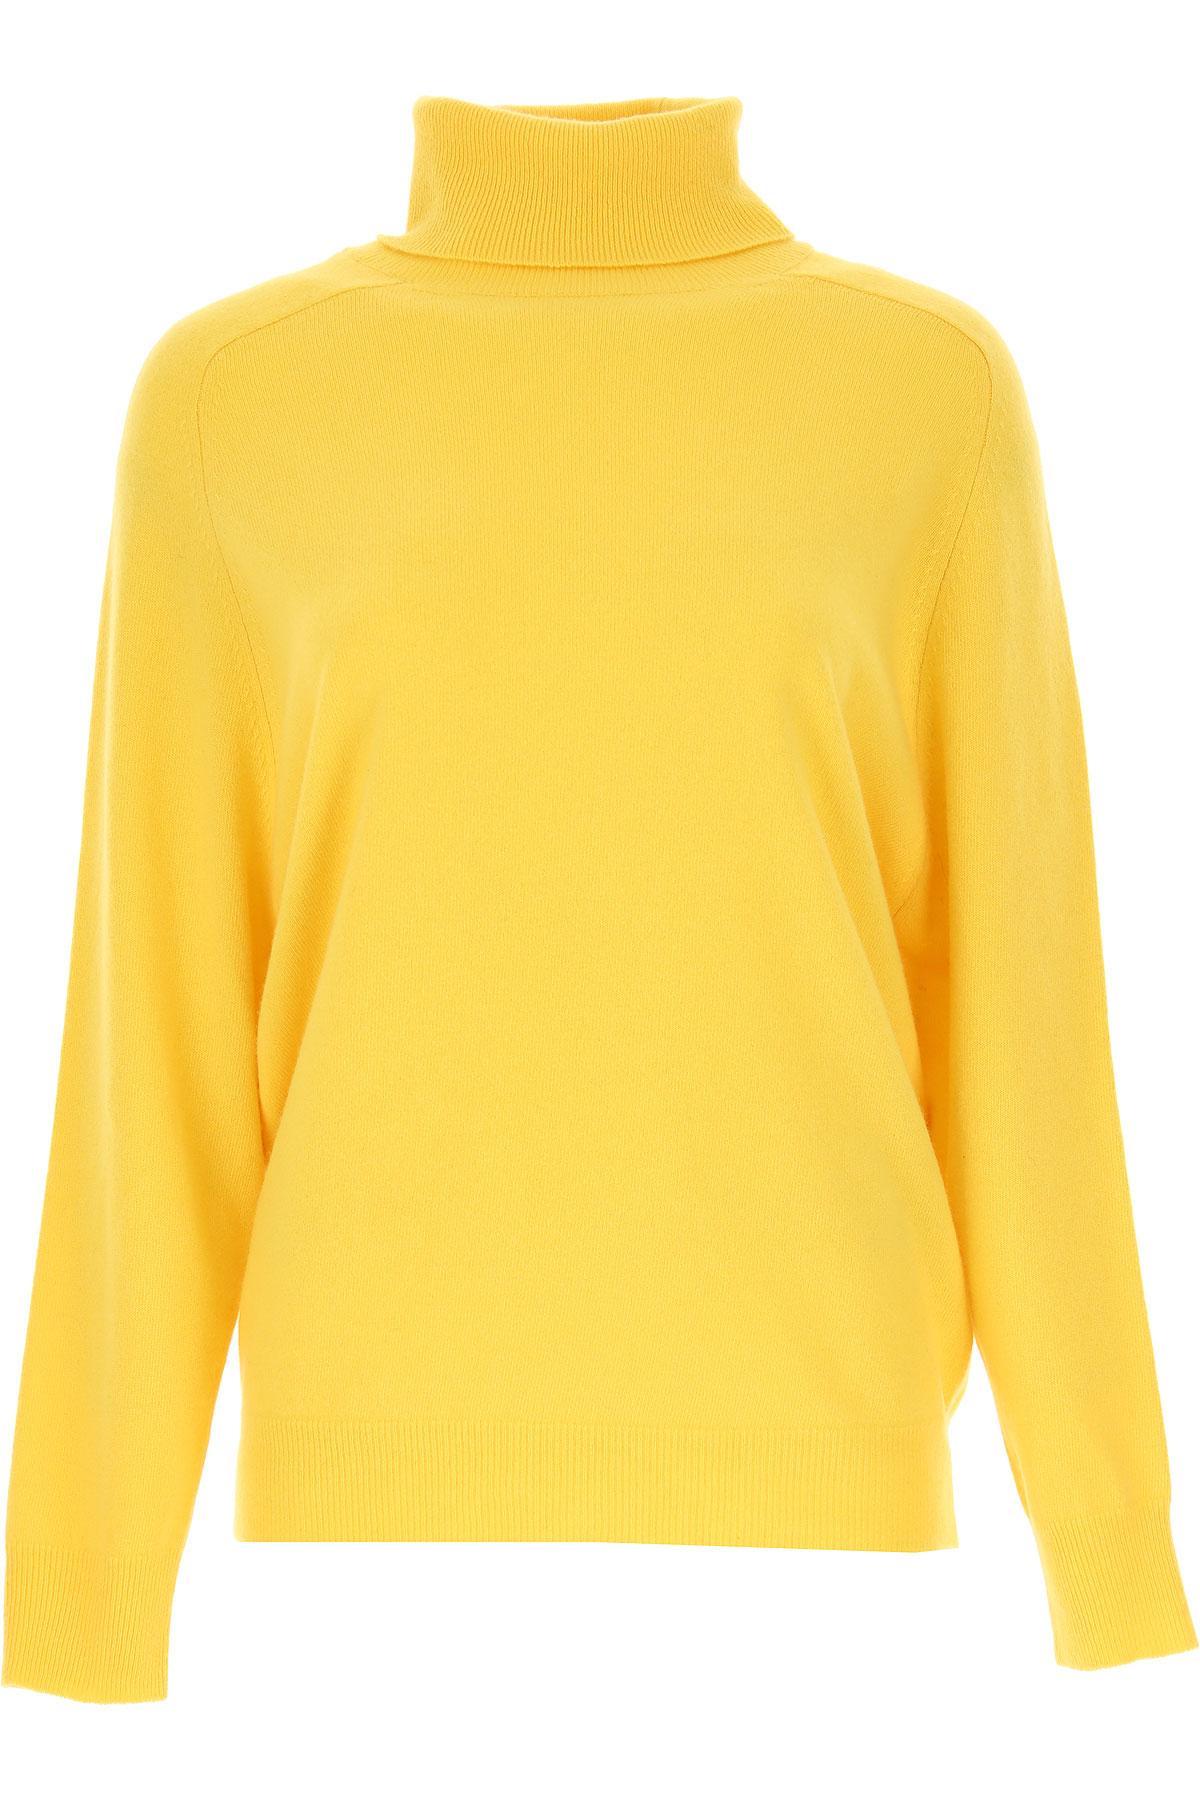 Erika Cavallini Sweater for Women Jumper On Sale, Yellow, Wool, 2019, 4 6